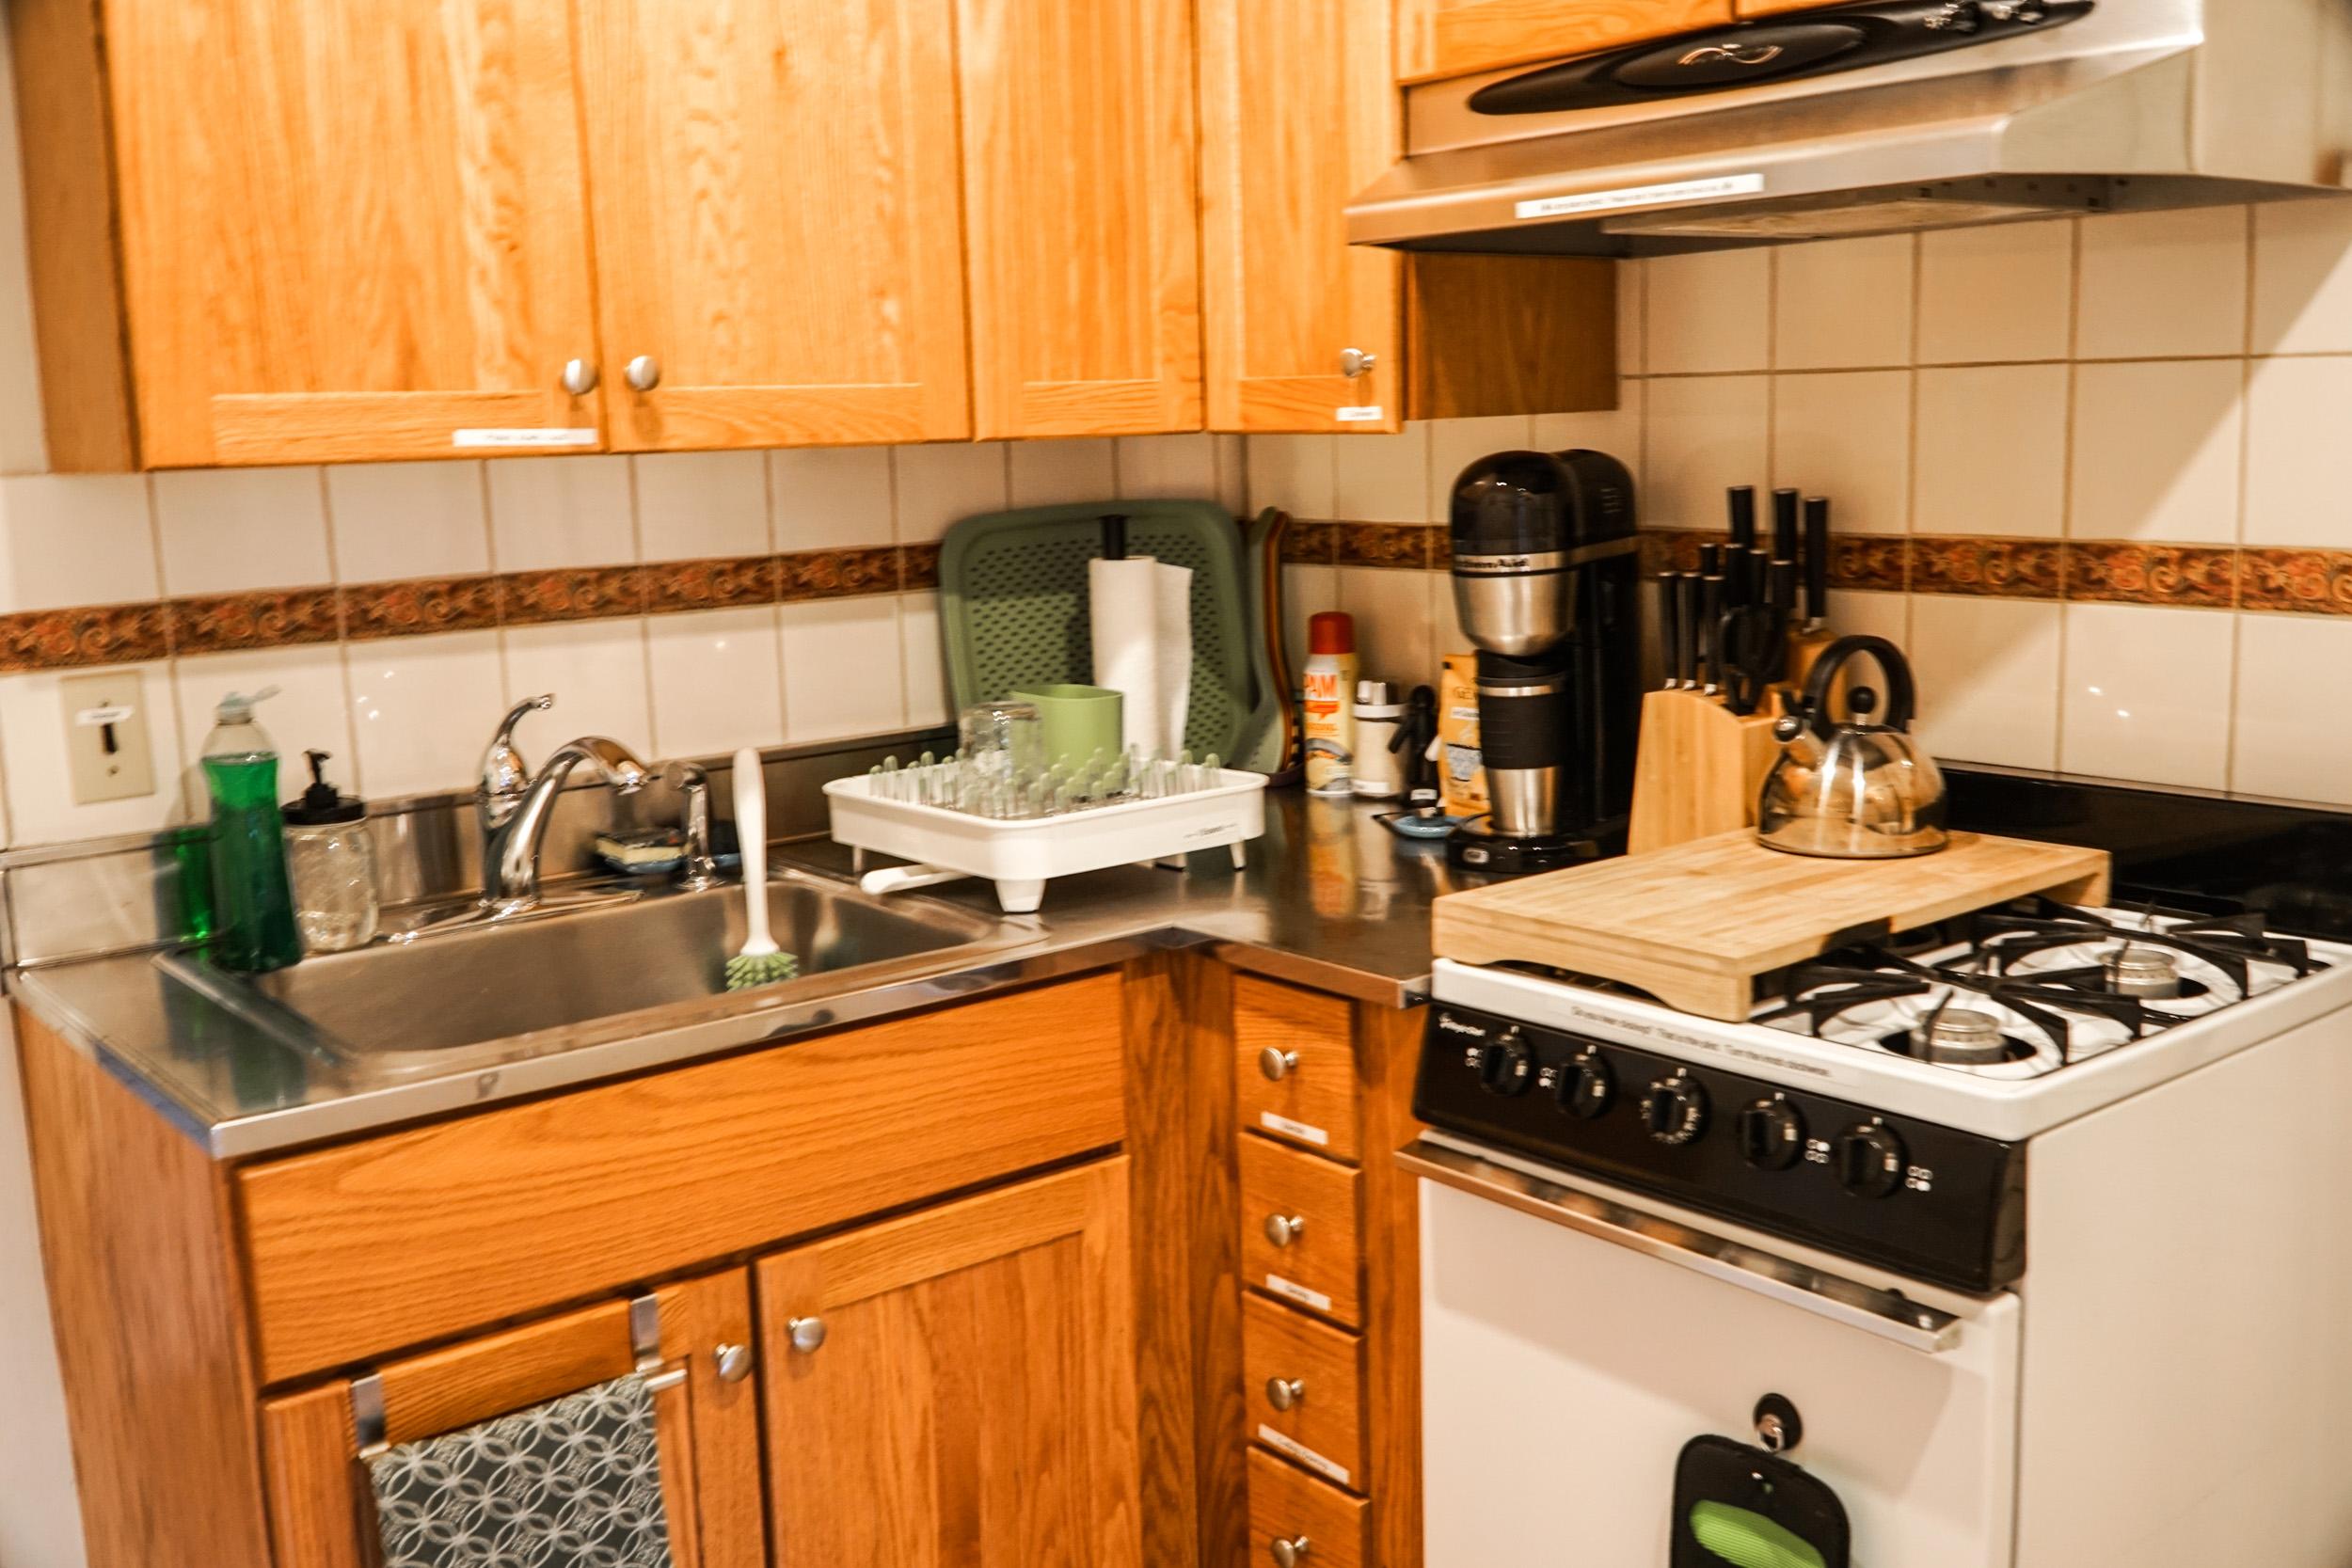 Washington DC Airbnb